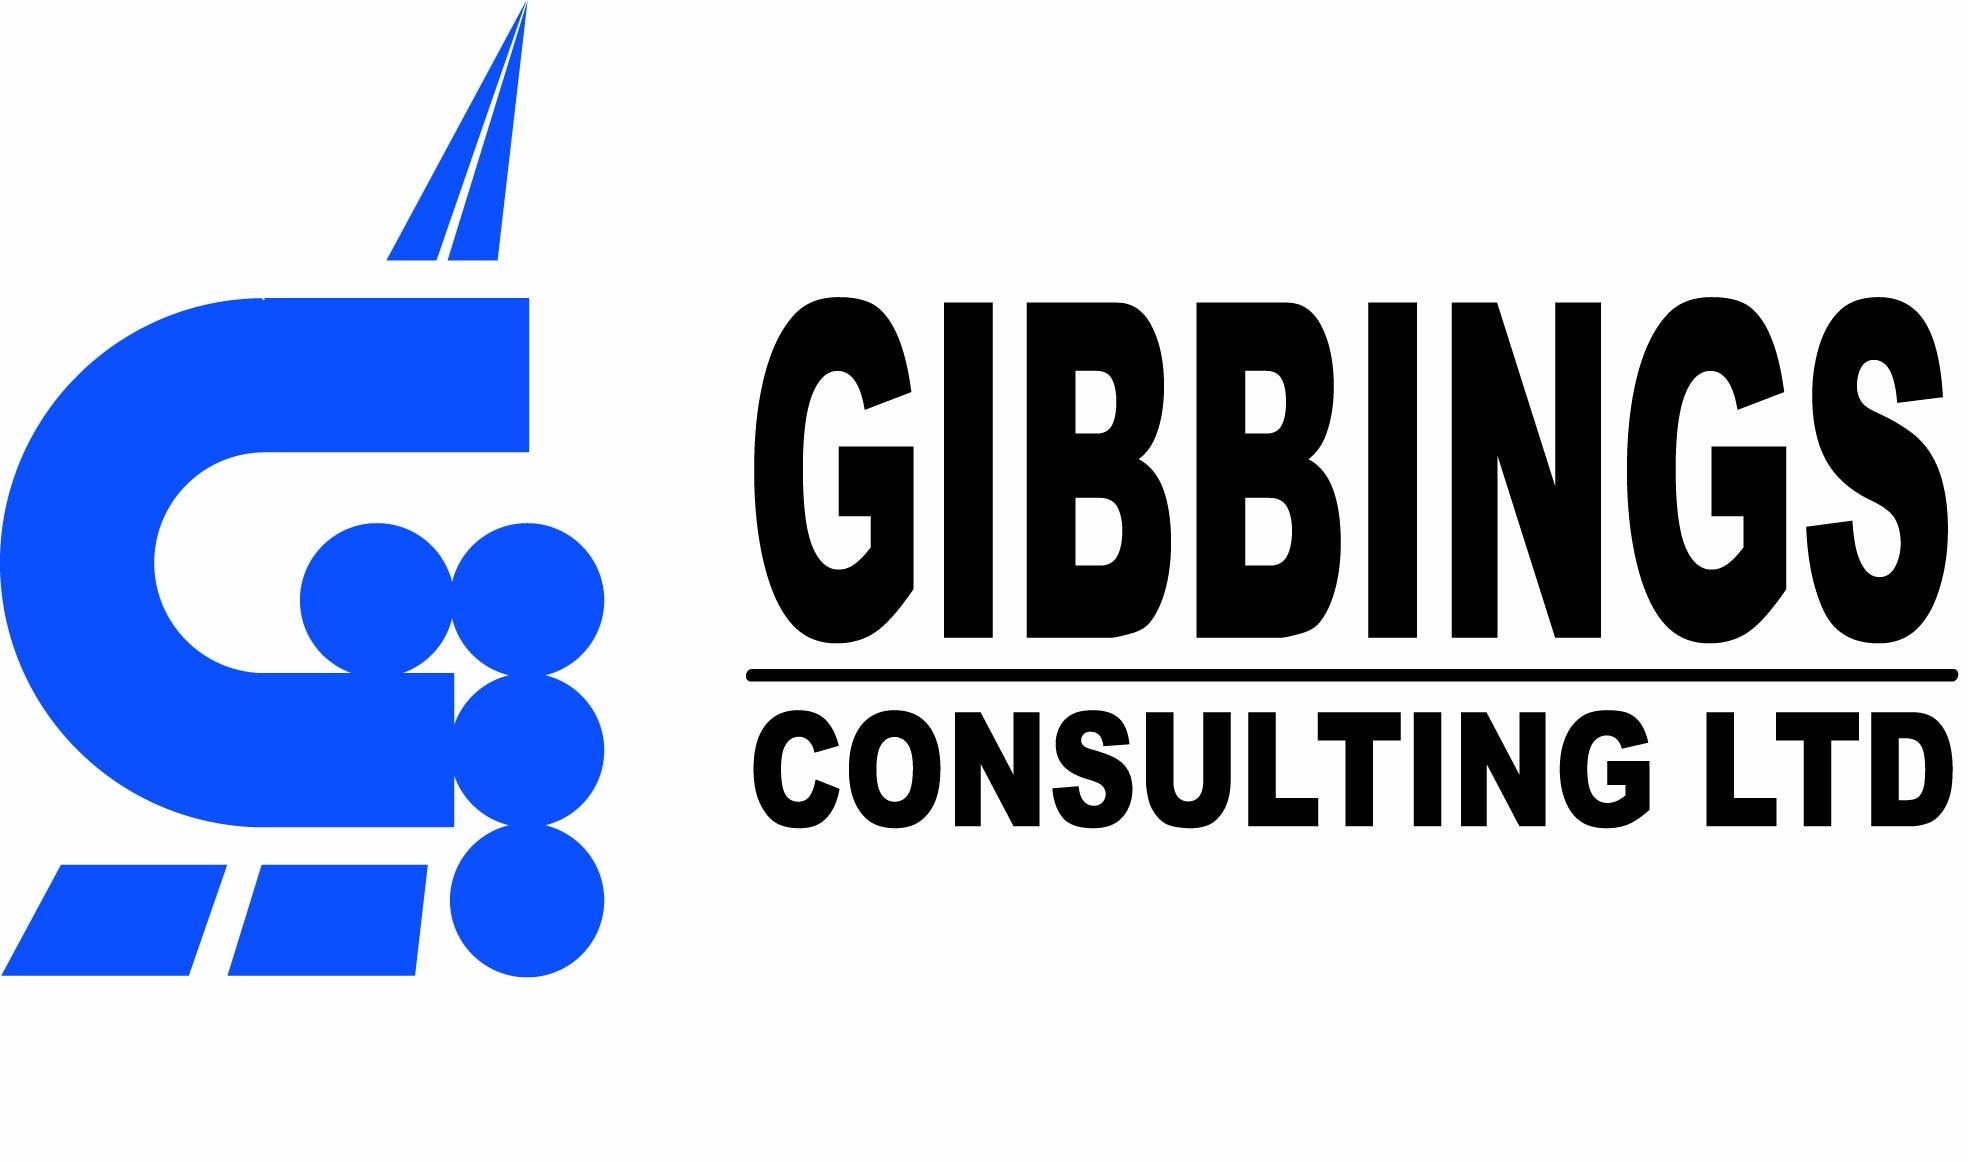 Gibbings Consulting Ltd